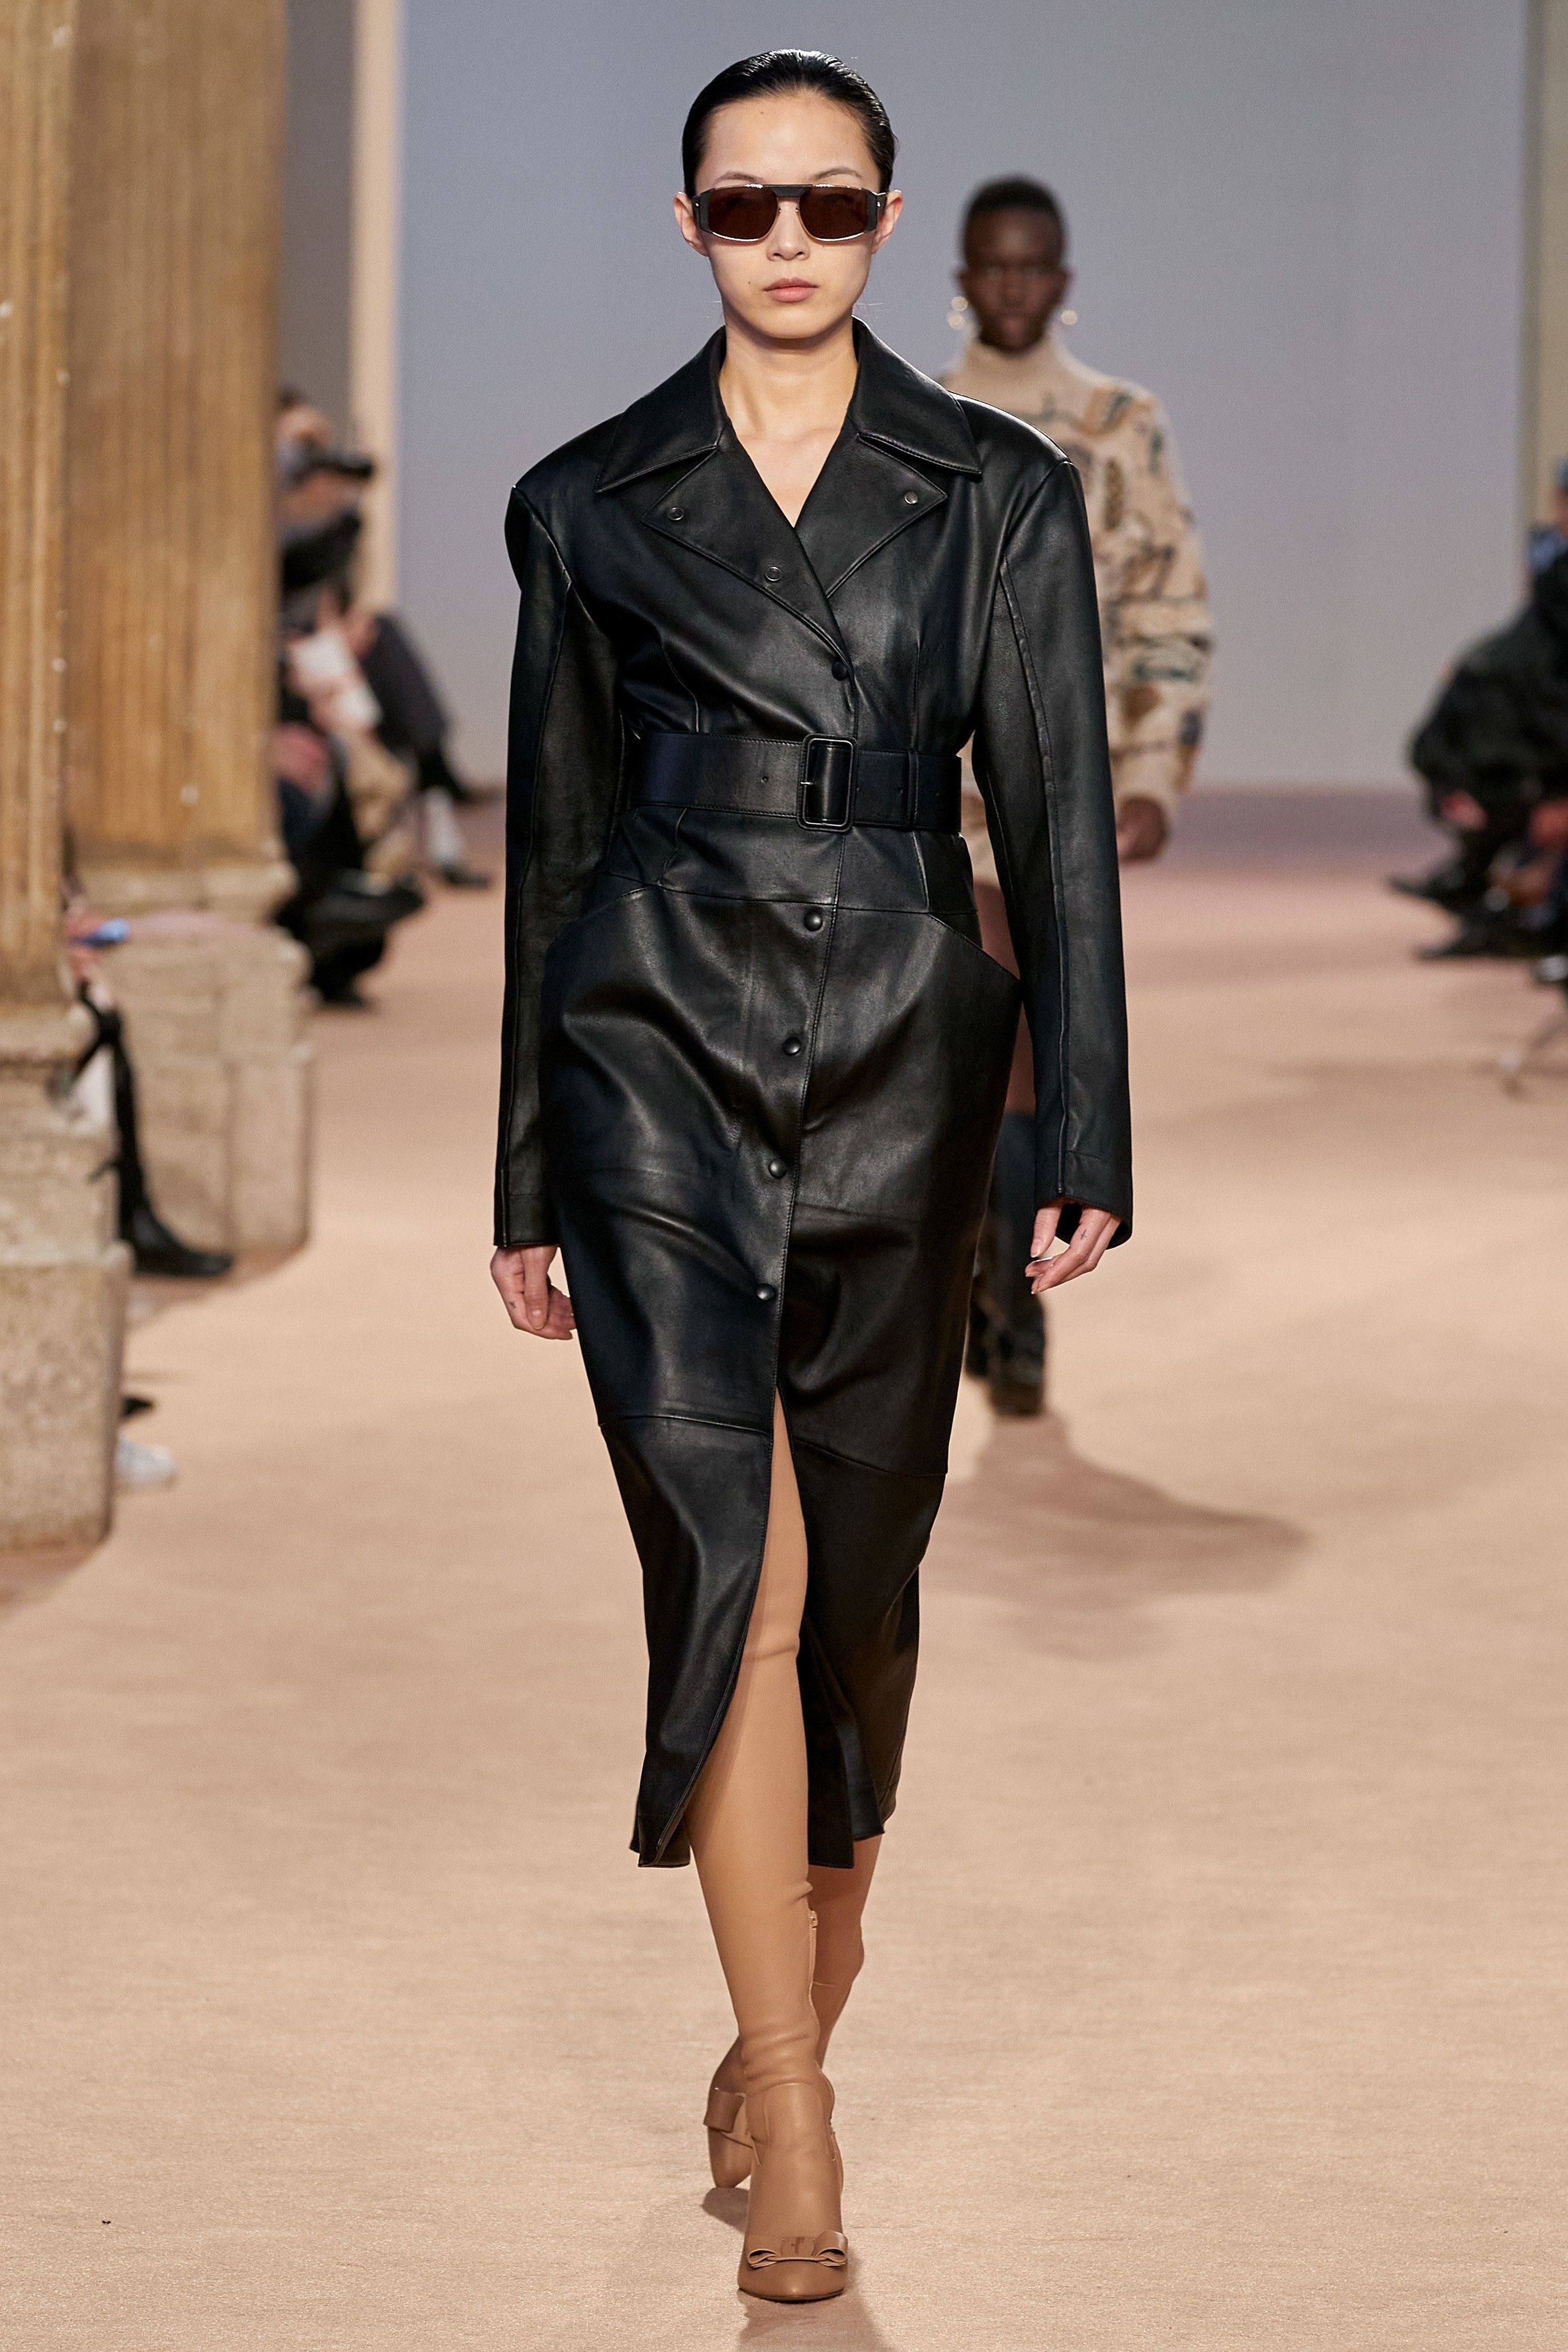 ex Colector valores  Milan Fashion Week FW 2020: Salvatore Ferragamo Minimalist Belted Coat    Clothia   Ready to wear, Milan fashion week, Fashion show